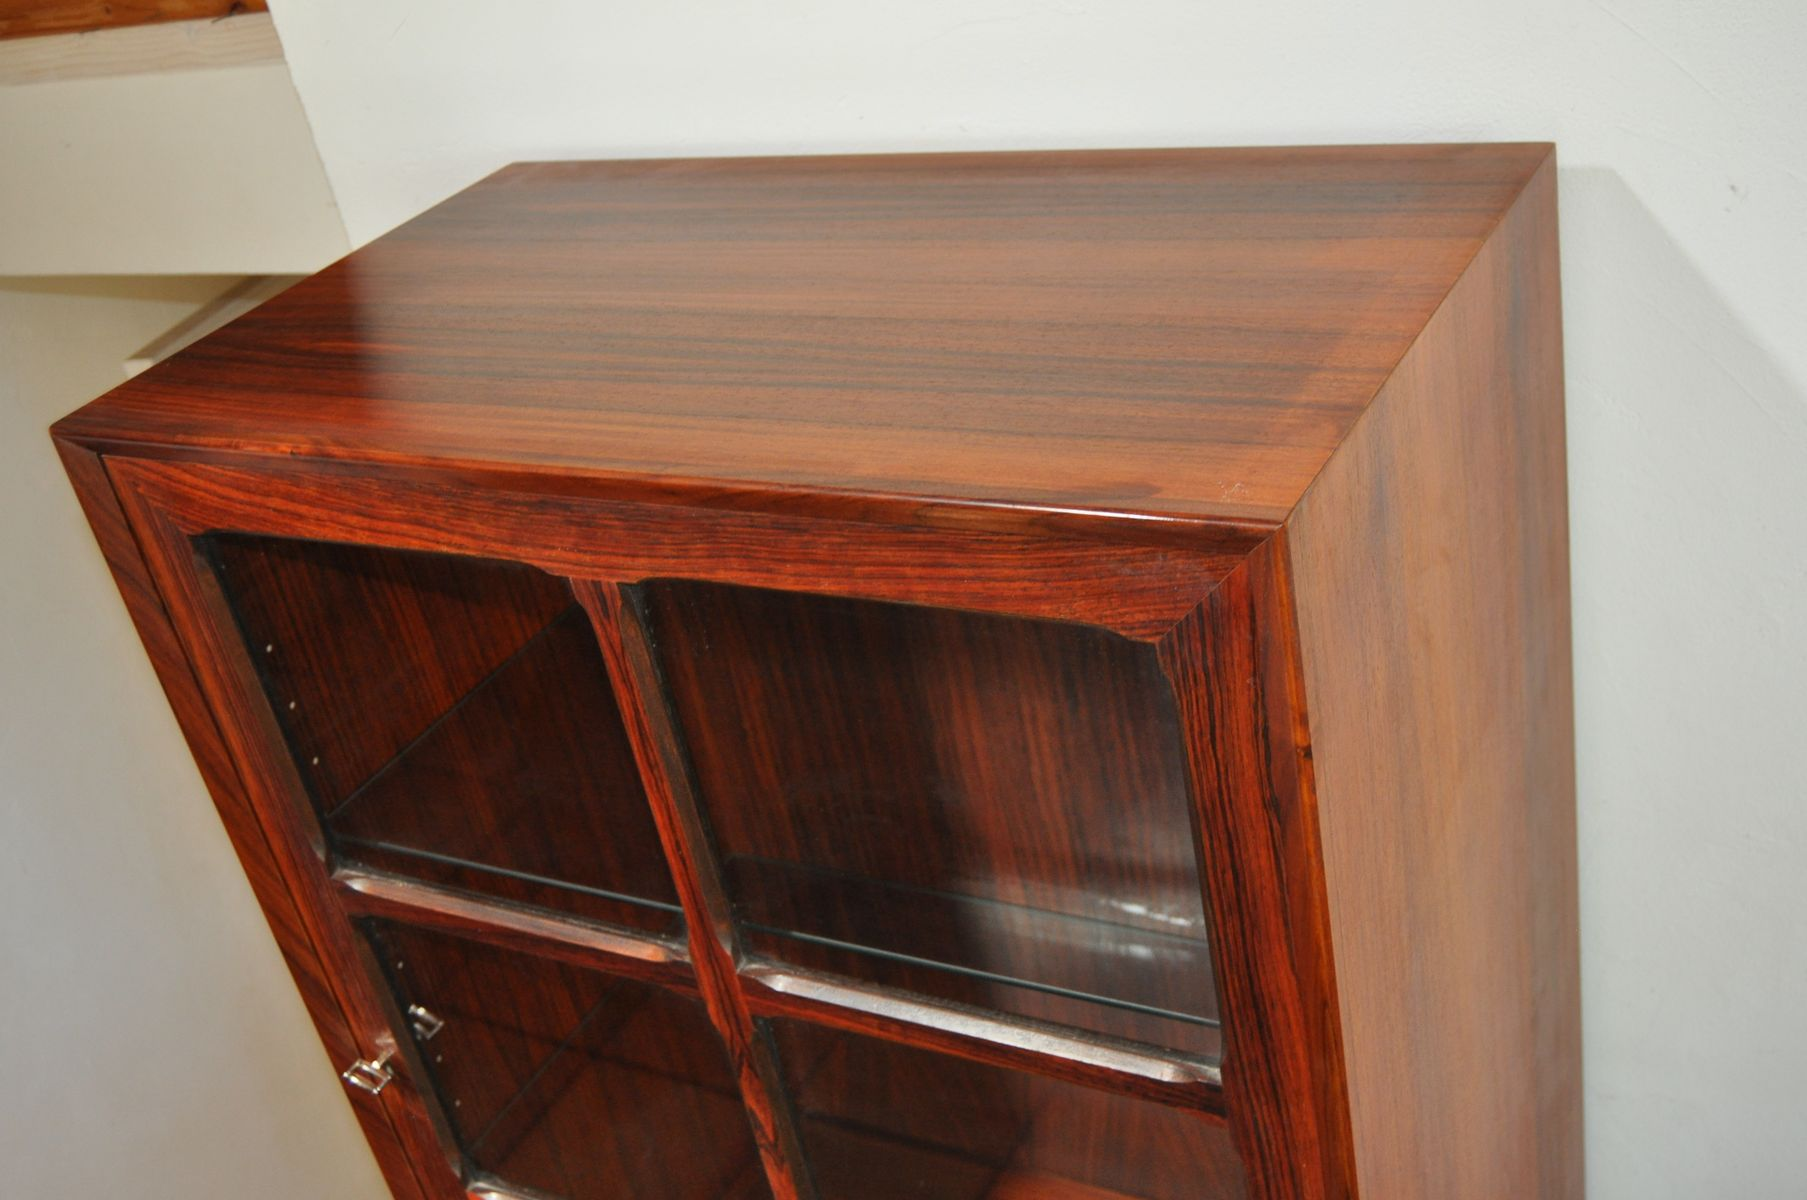 vintage danish rosewood vitrine 1970s for sale at pamono. Black Bedroom Furniture Sets. Home Design Ideas